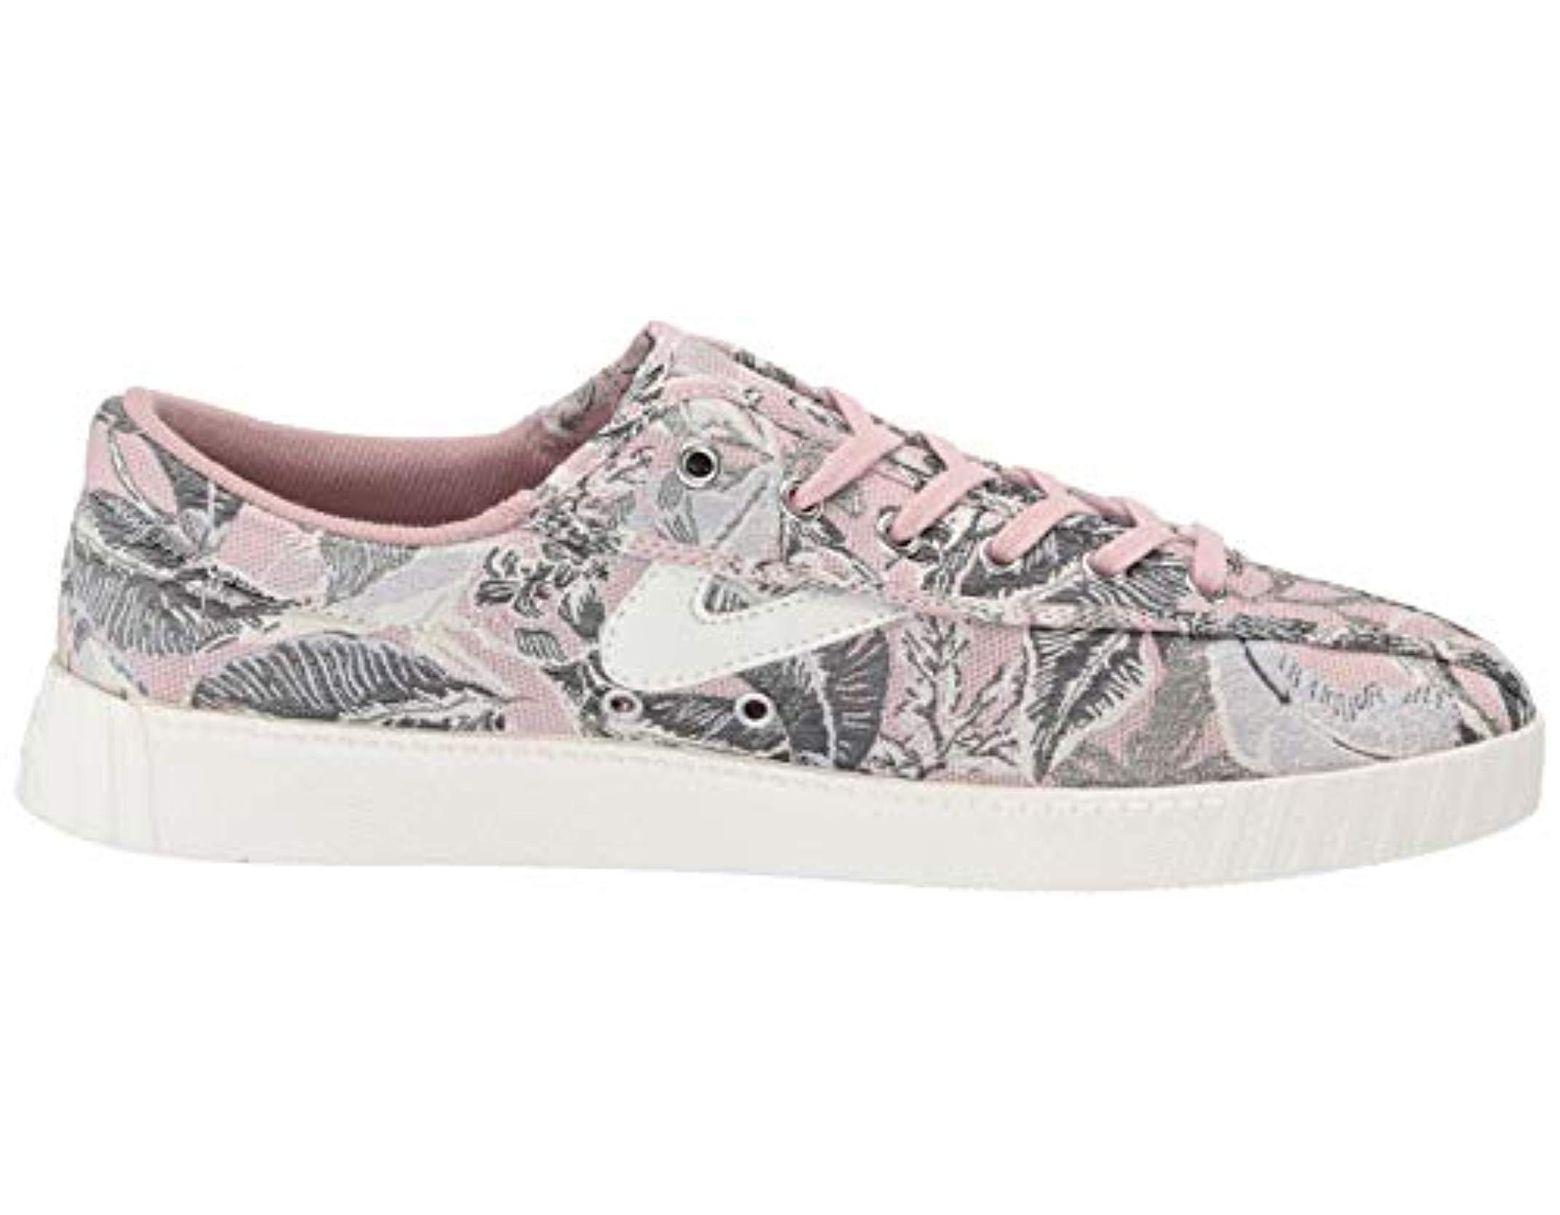 Women's Nylite 19 Plus (pinkgreenwhite) Cross Training Shoes